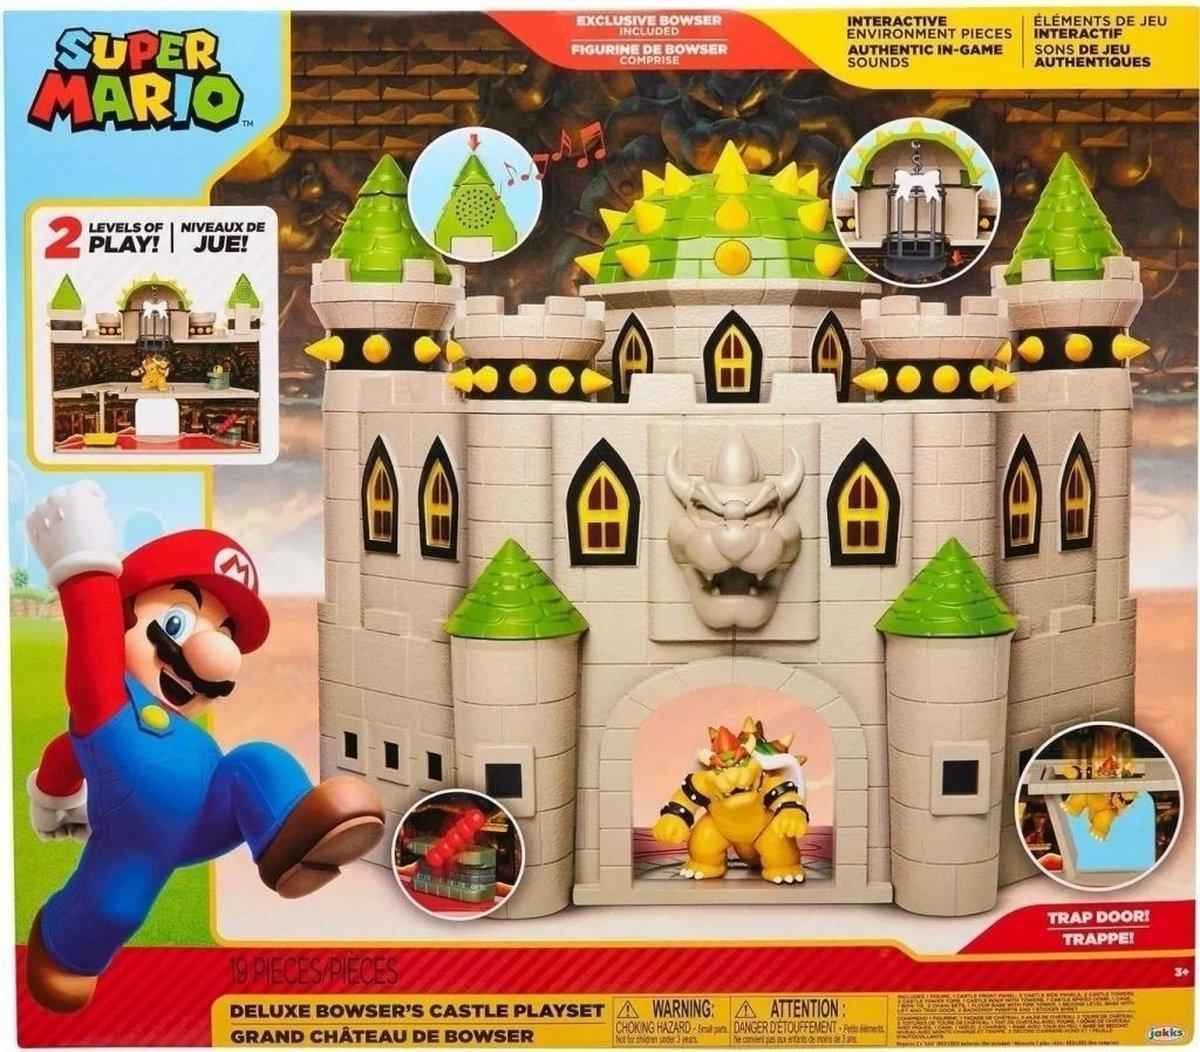 Super Mario Deluxe Bowser's Castle Playset